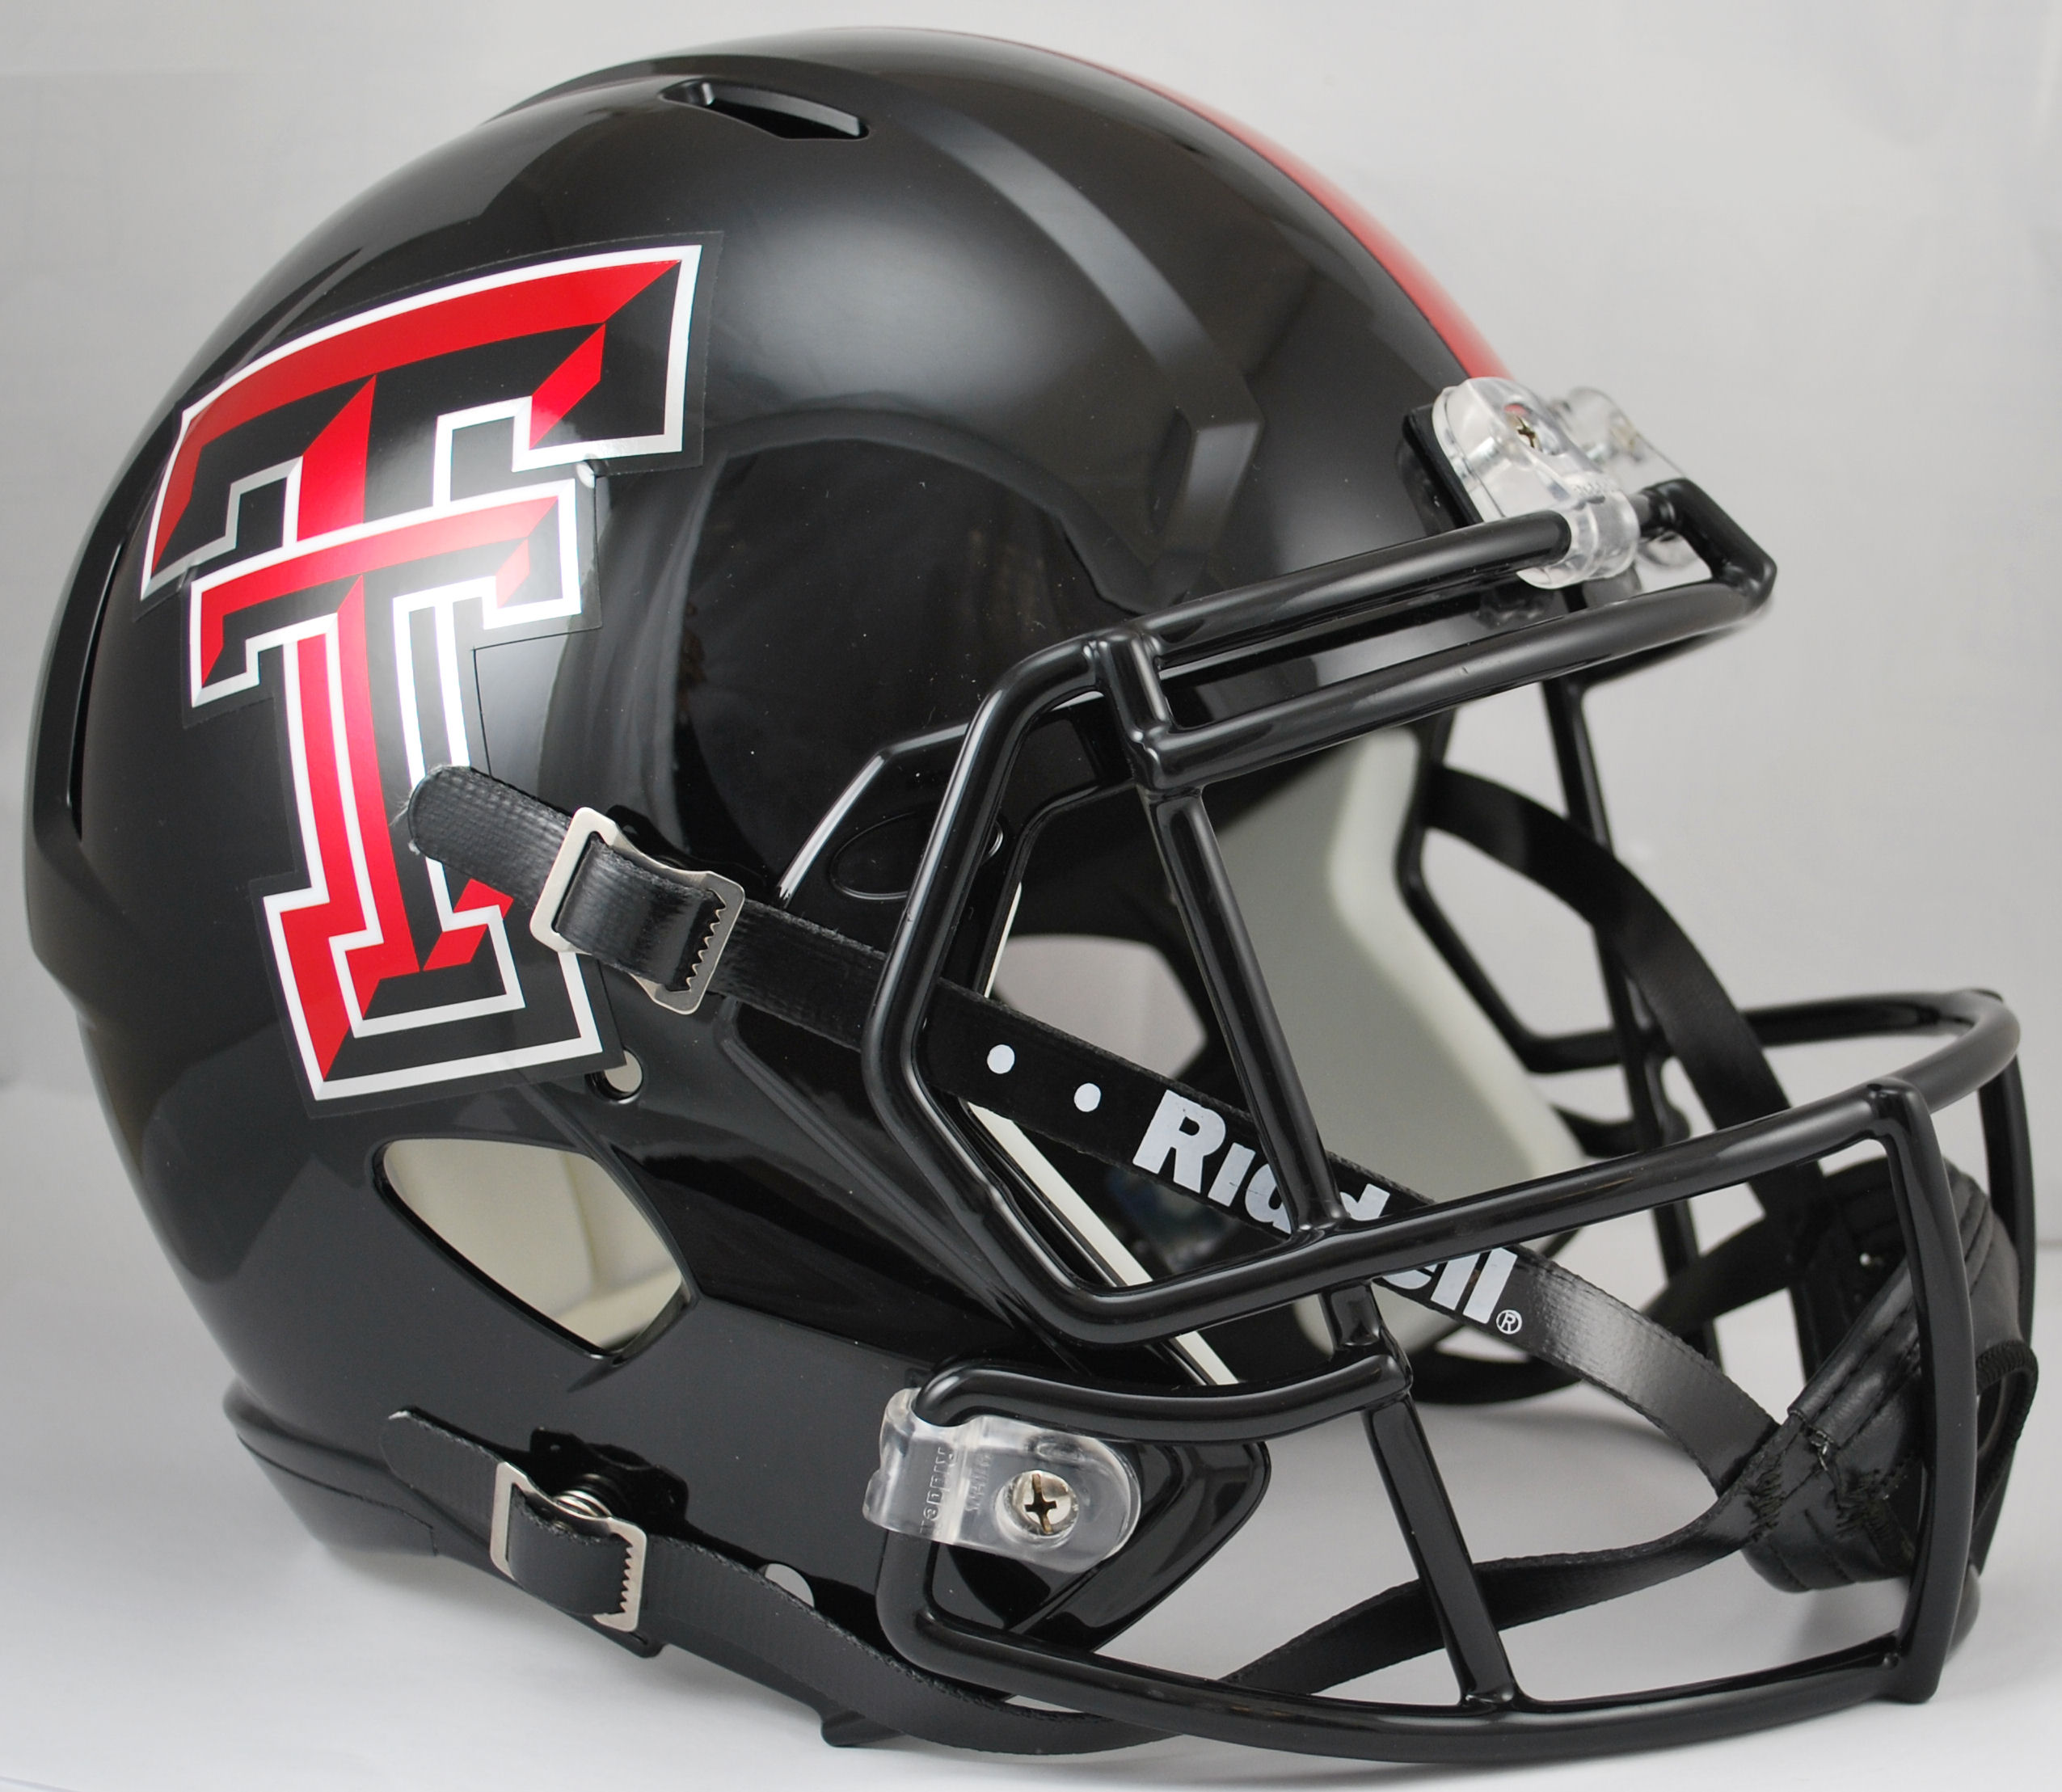 Texas Tech Red Raiders Speed Replica Football Helmet